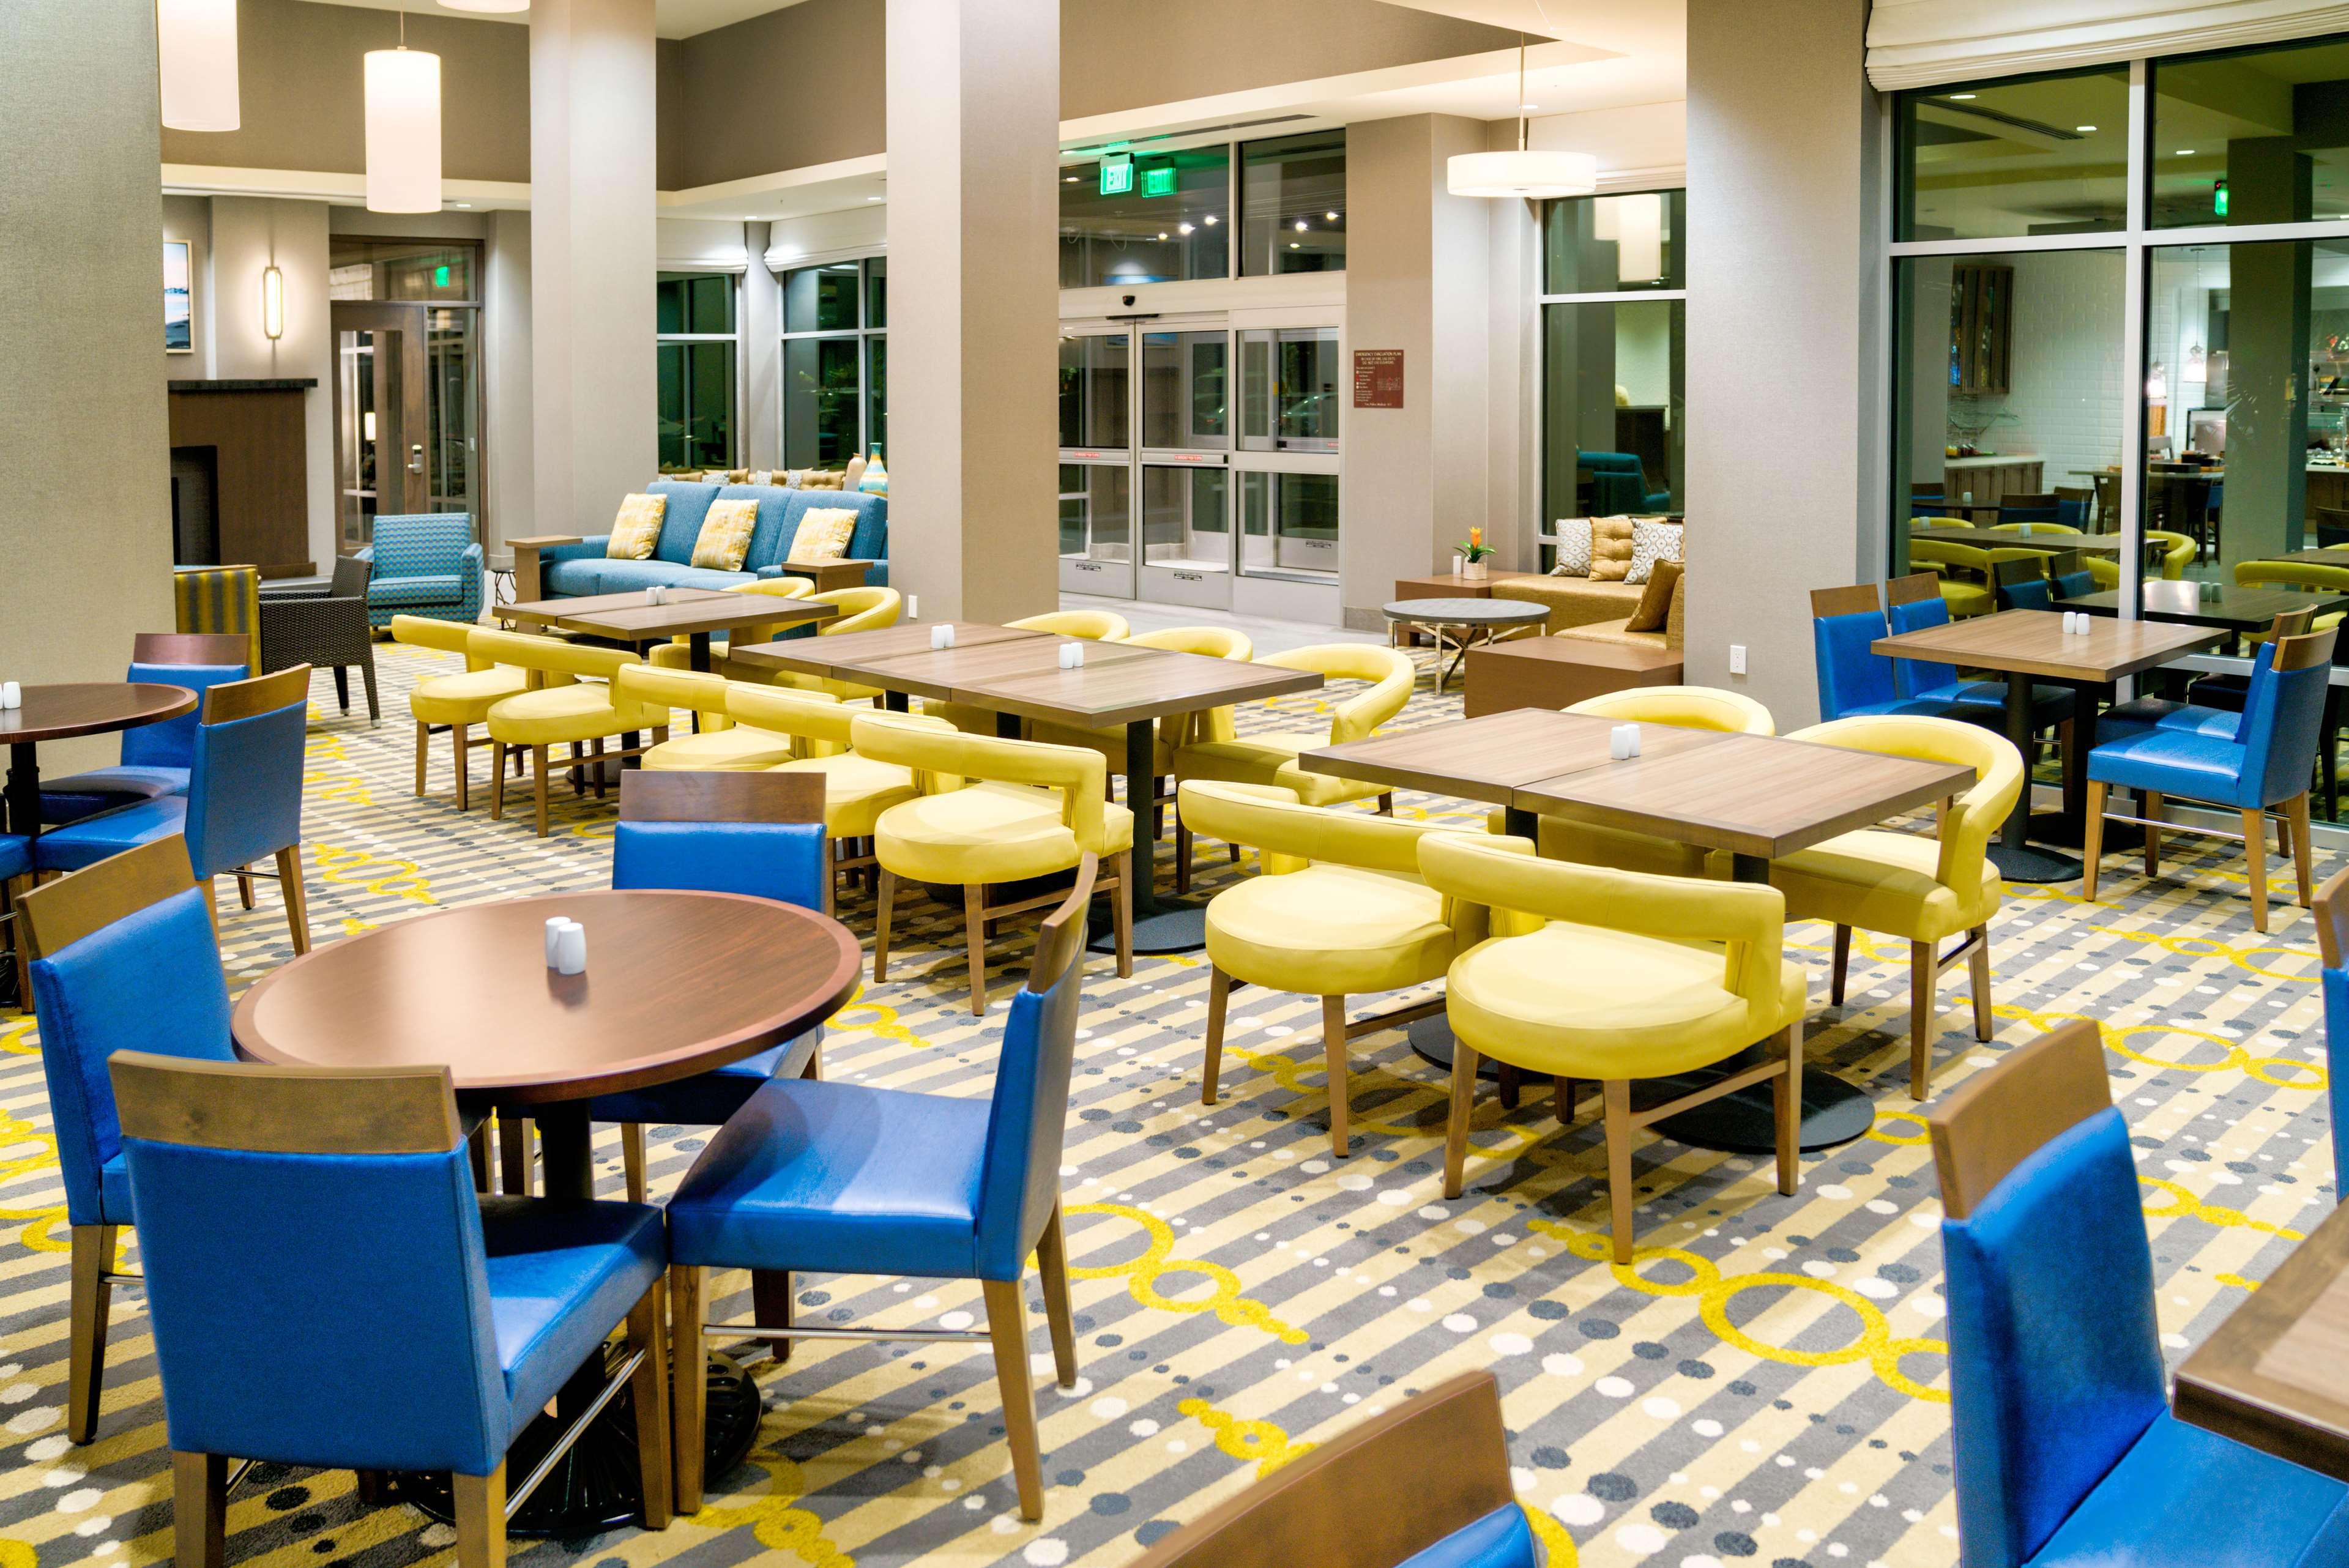 Hilton Garden Inn Santa Barbara/Goleta image 20